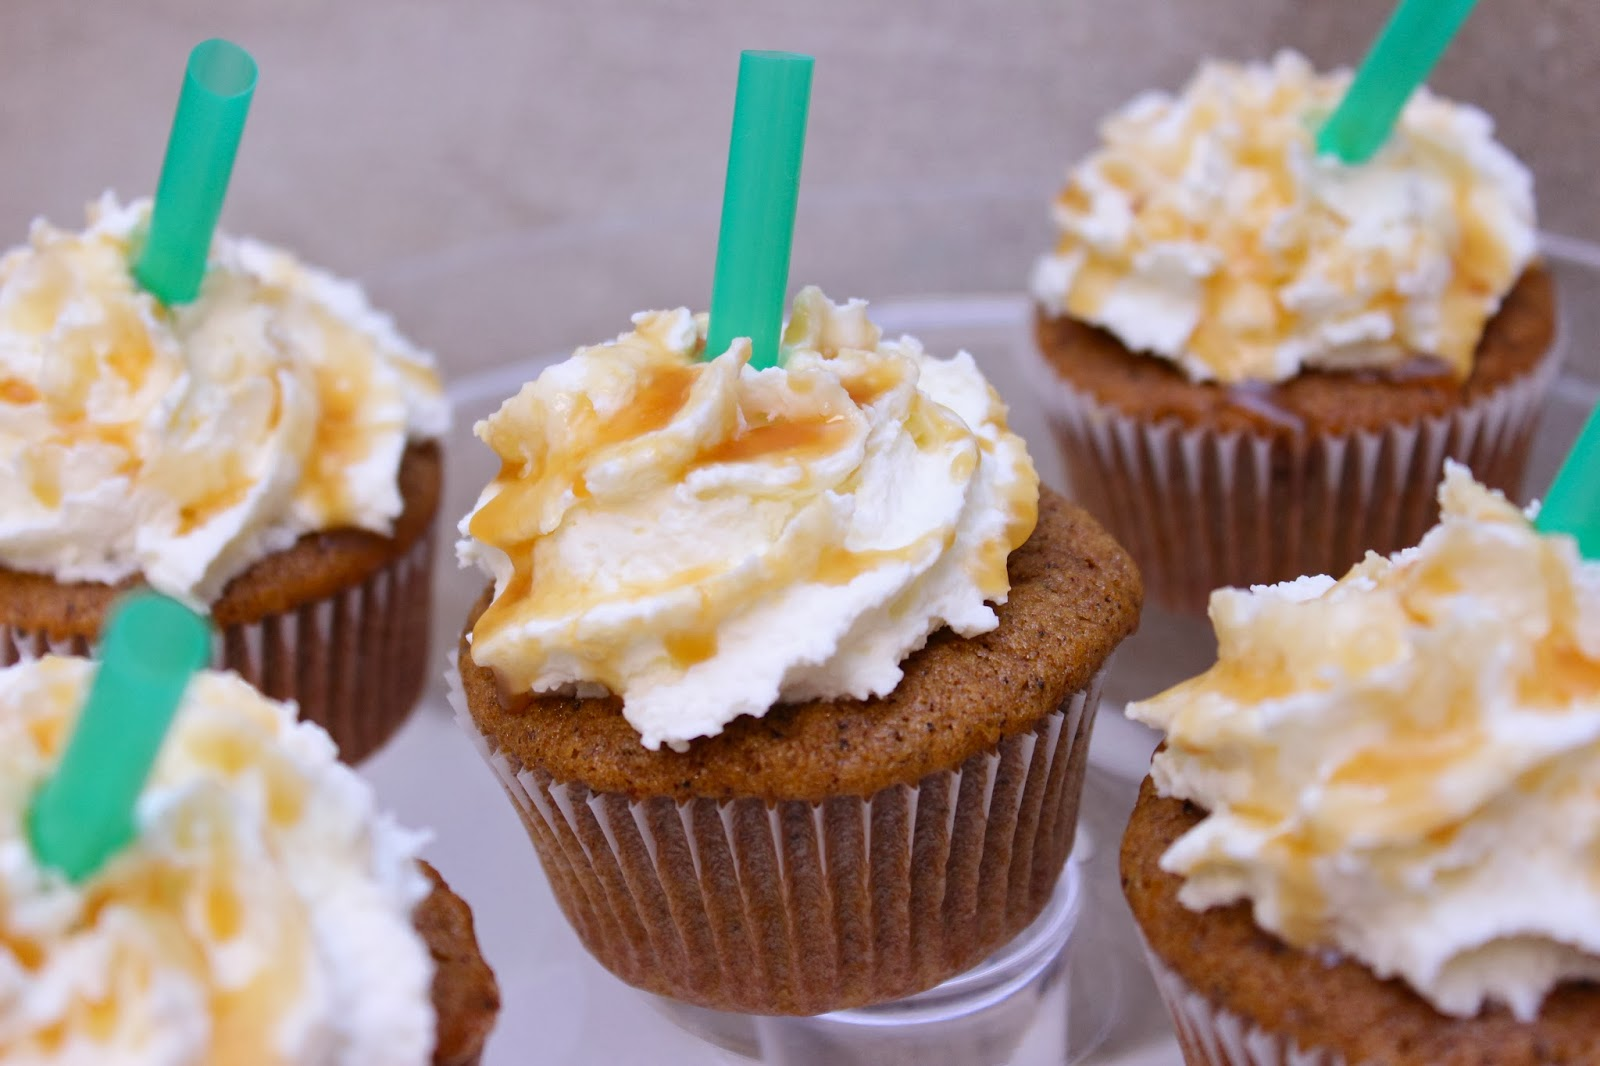 CupcakesOMG!: Pumpkin Spice Latte Cupcakes